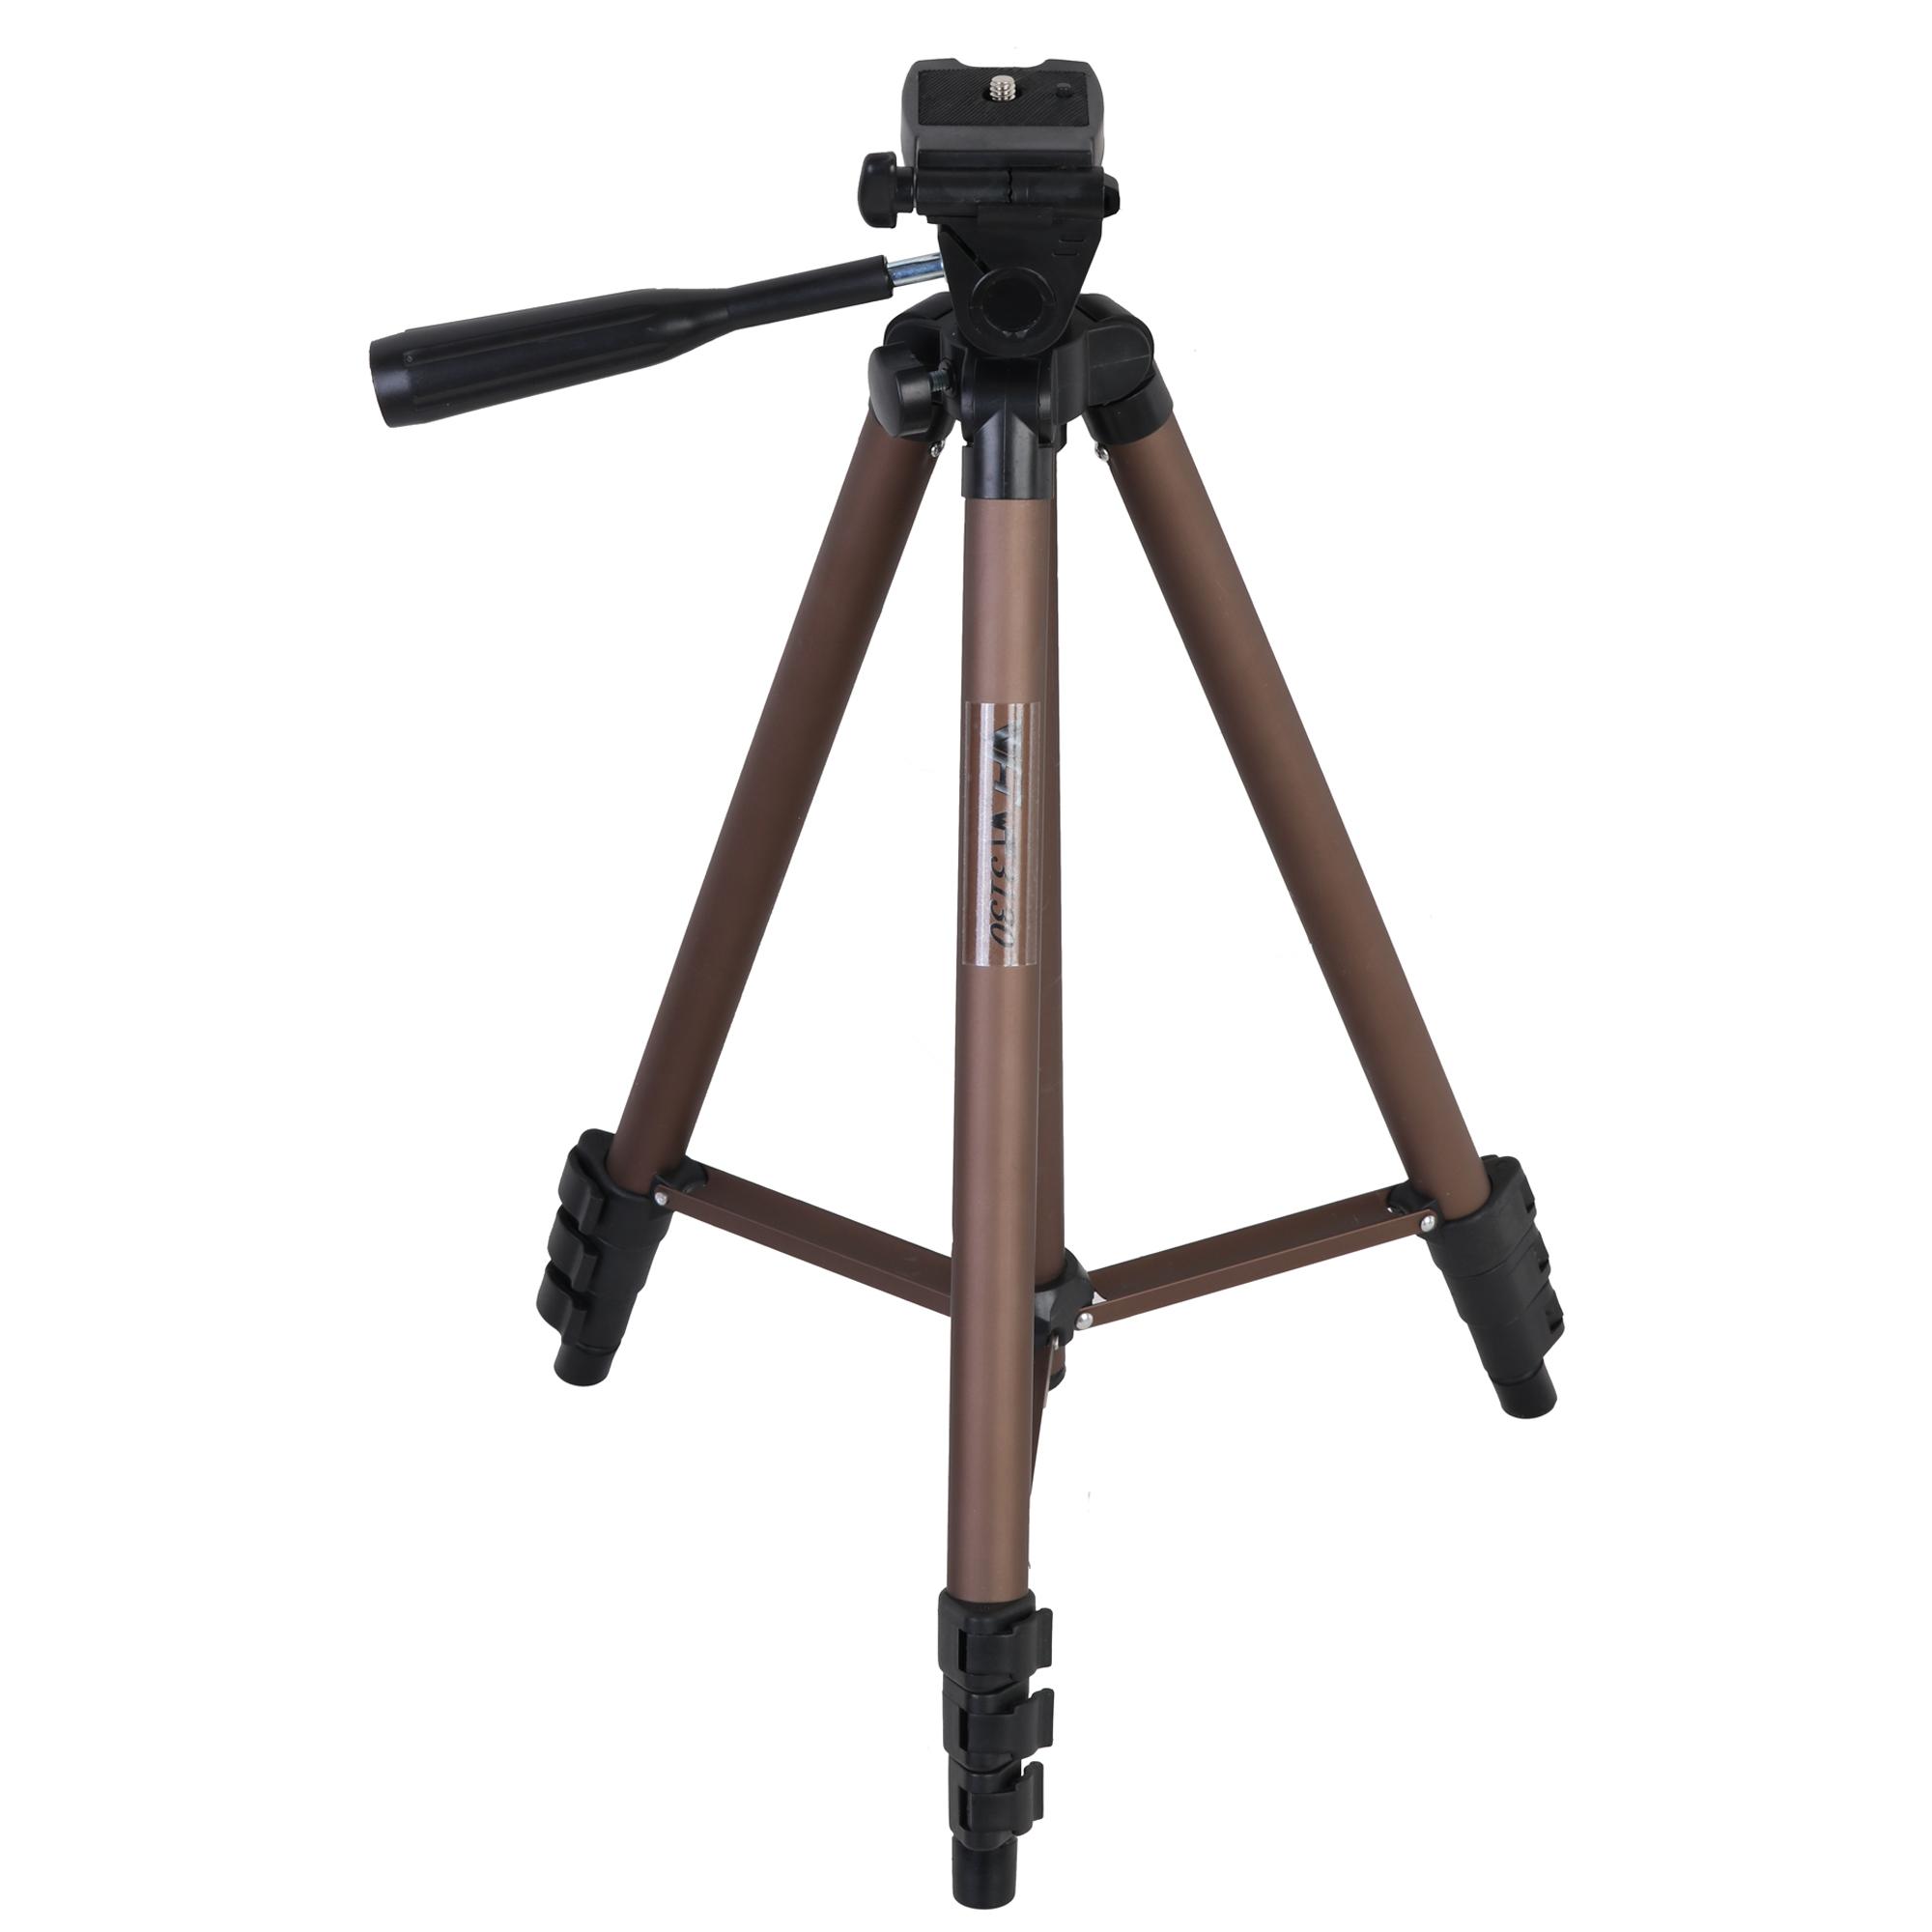 سه پایه دوربین ویفنگ مدل WT-3130